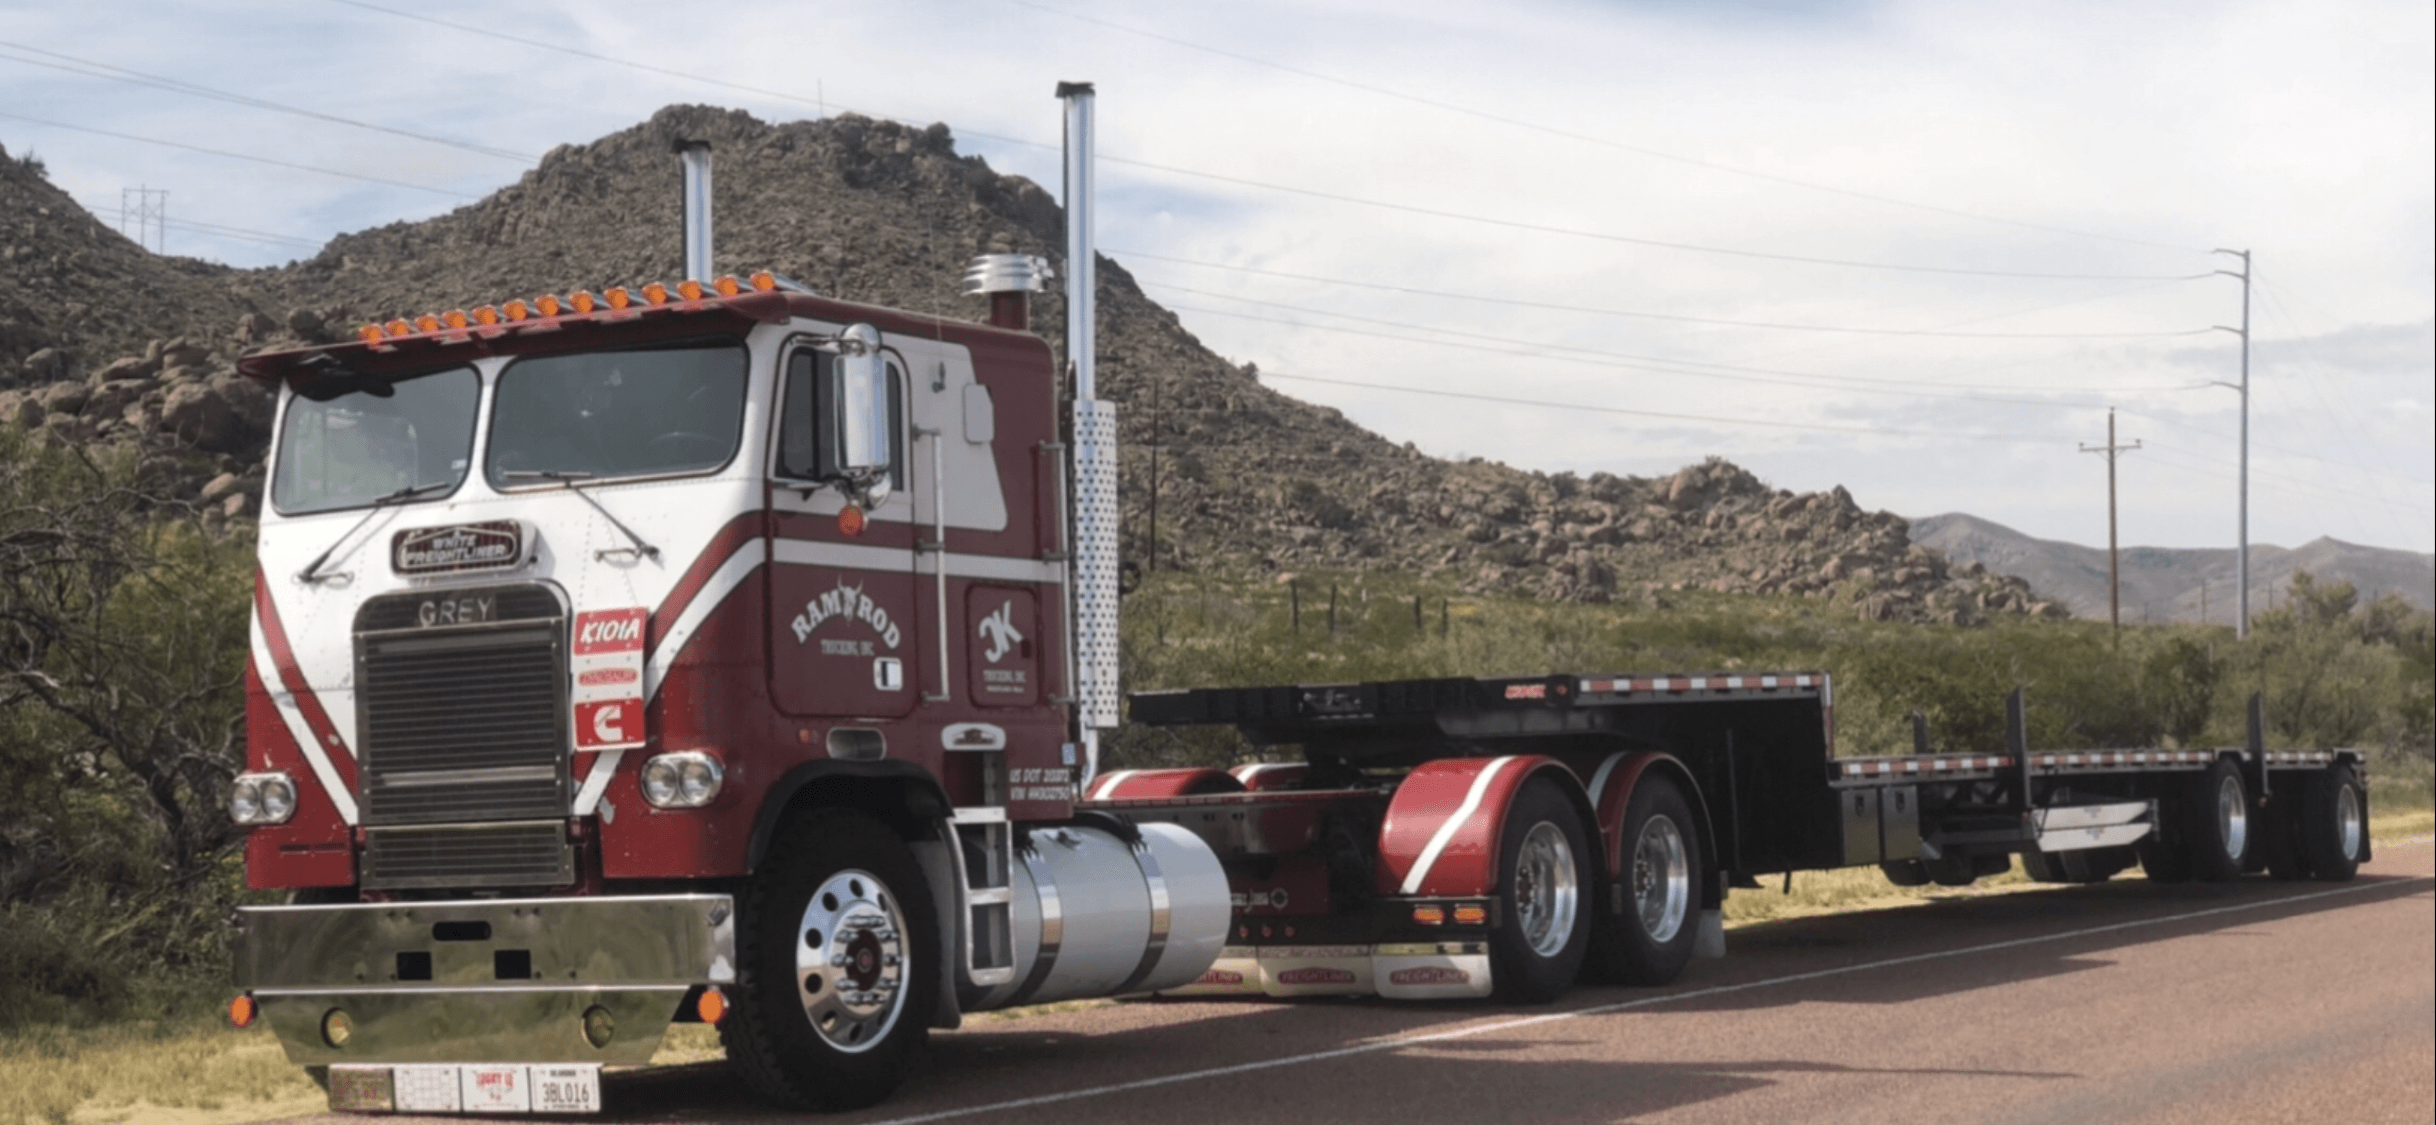 1987 Freightliner Flt